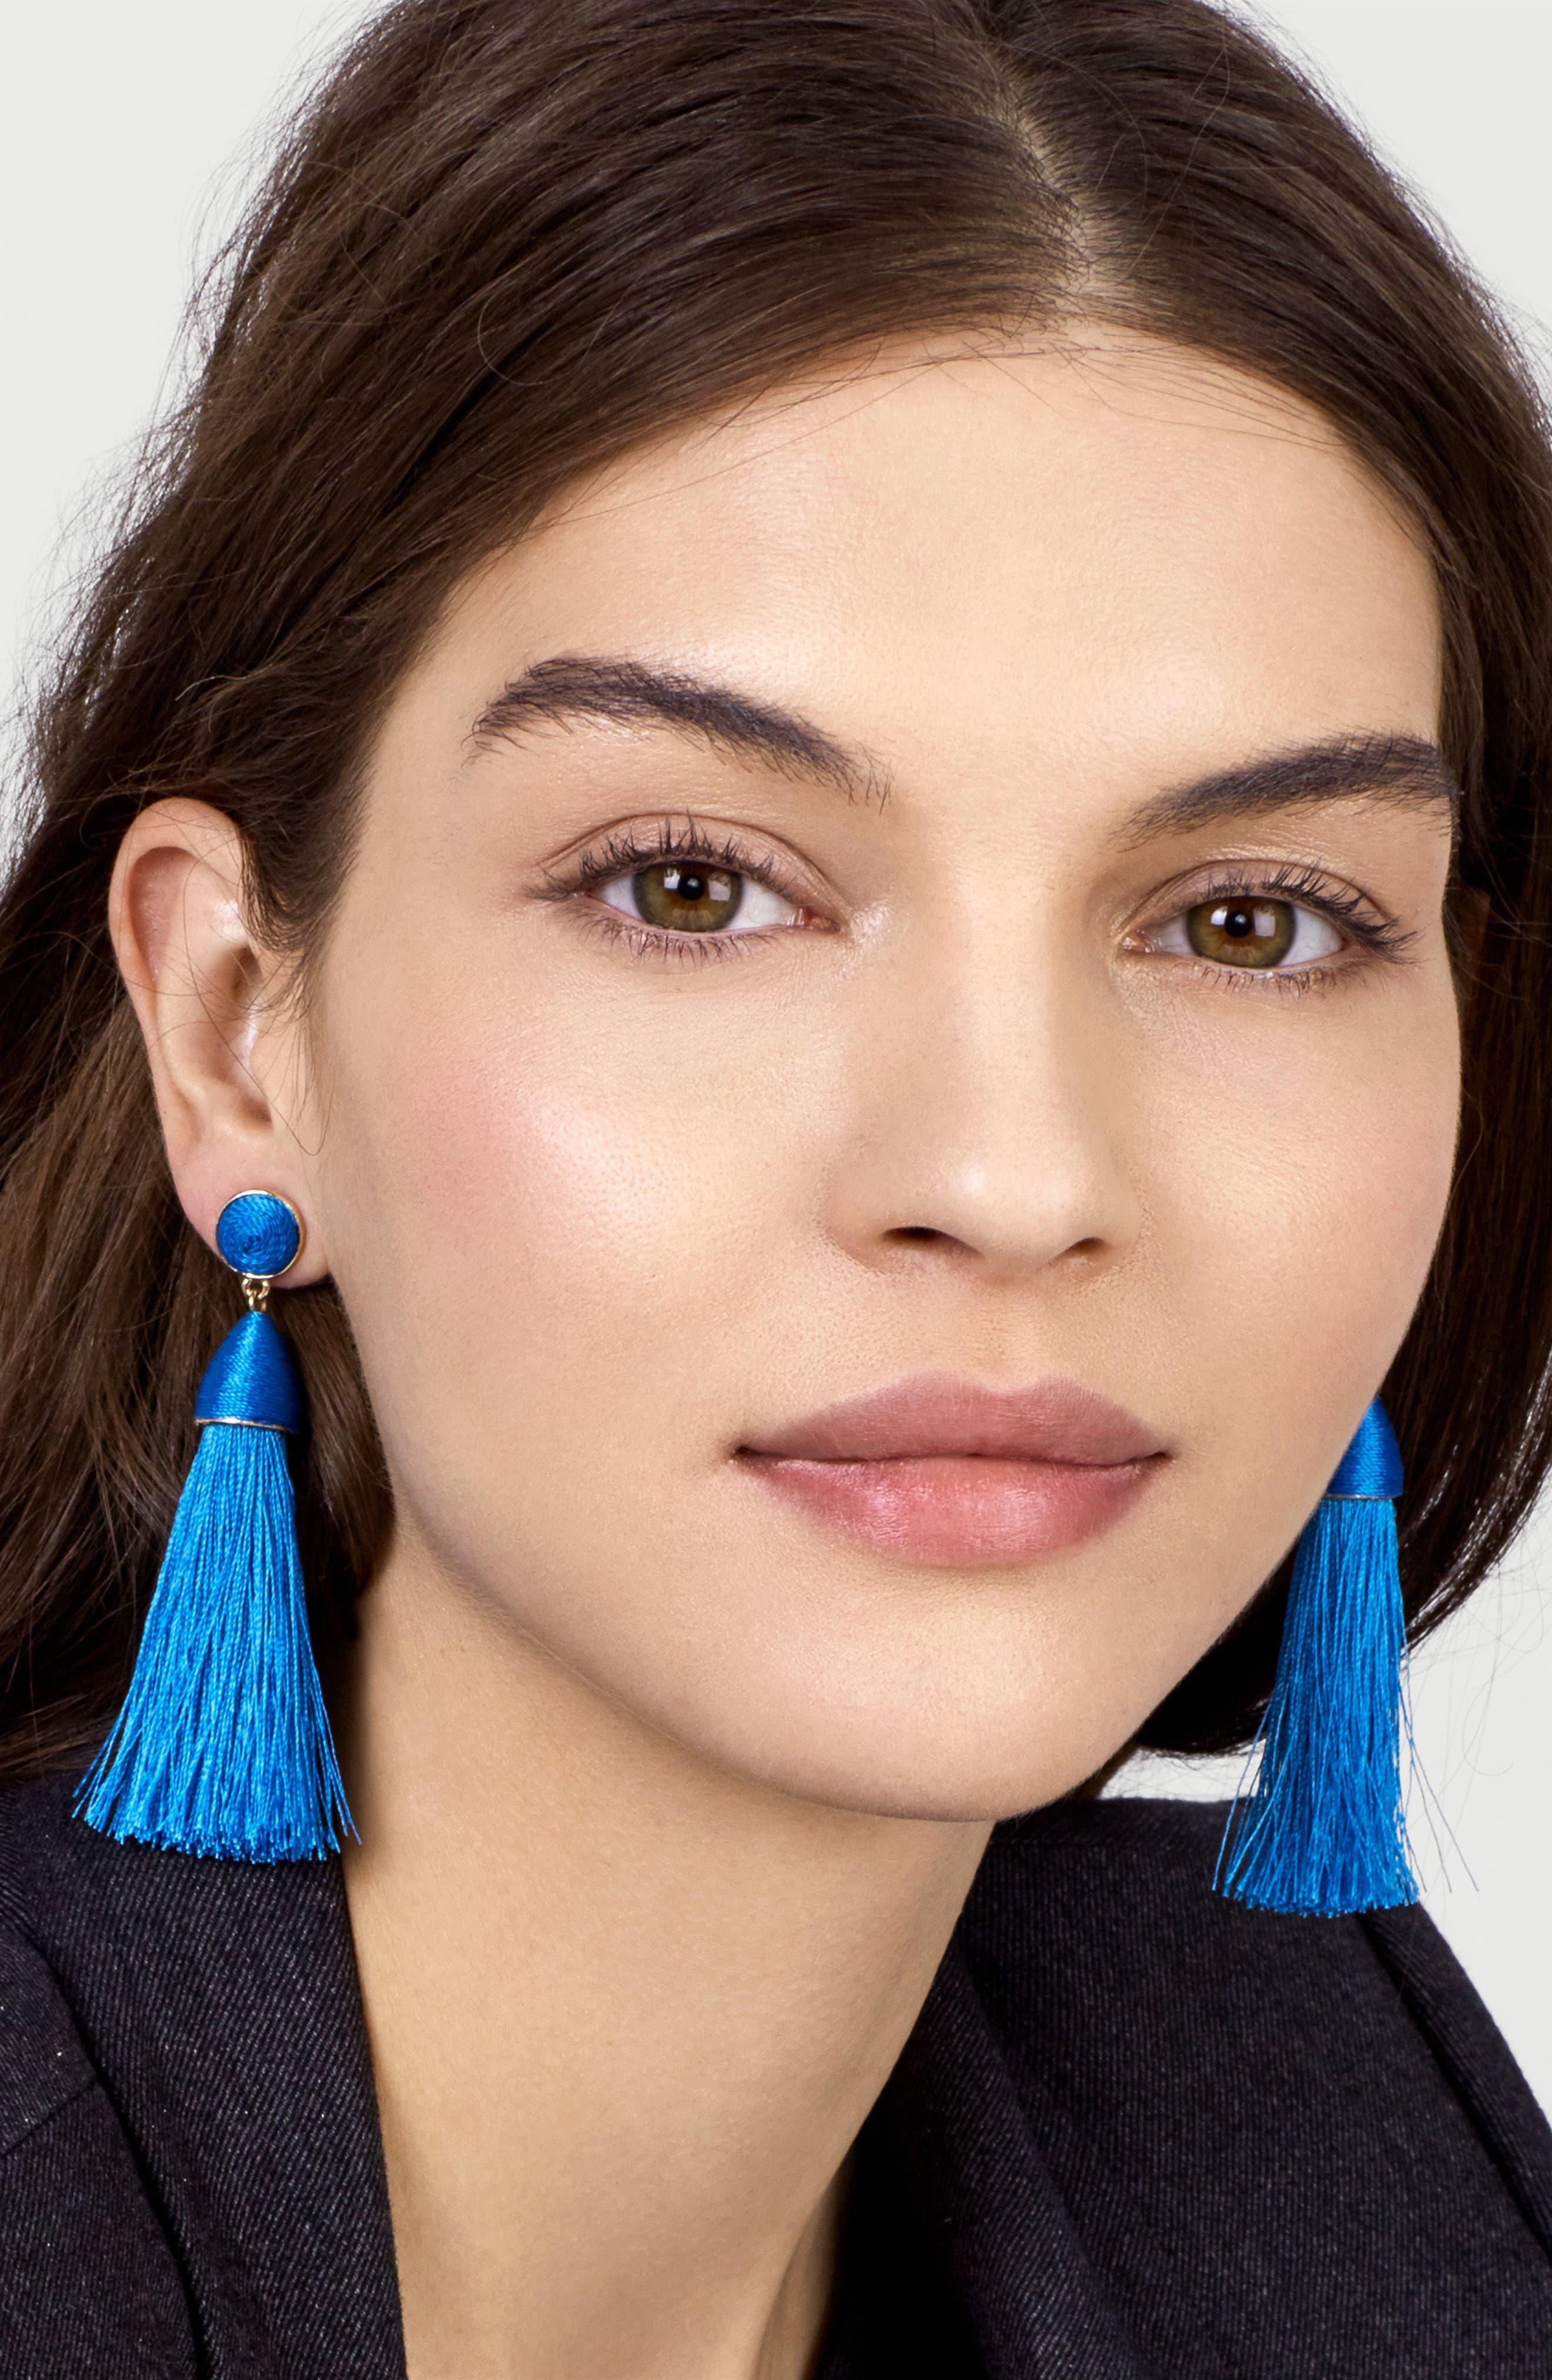 Rosabella Tassel Drop Earrings,                             Alternate thumbnail 2, color,                             Bright Blue